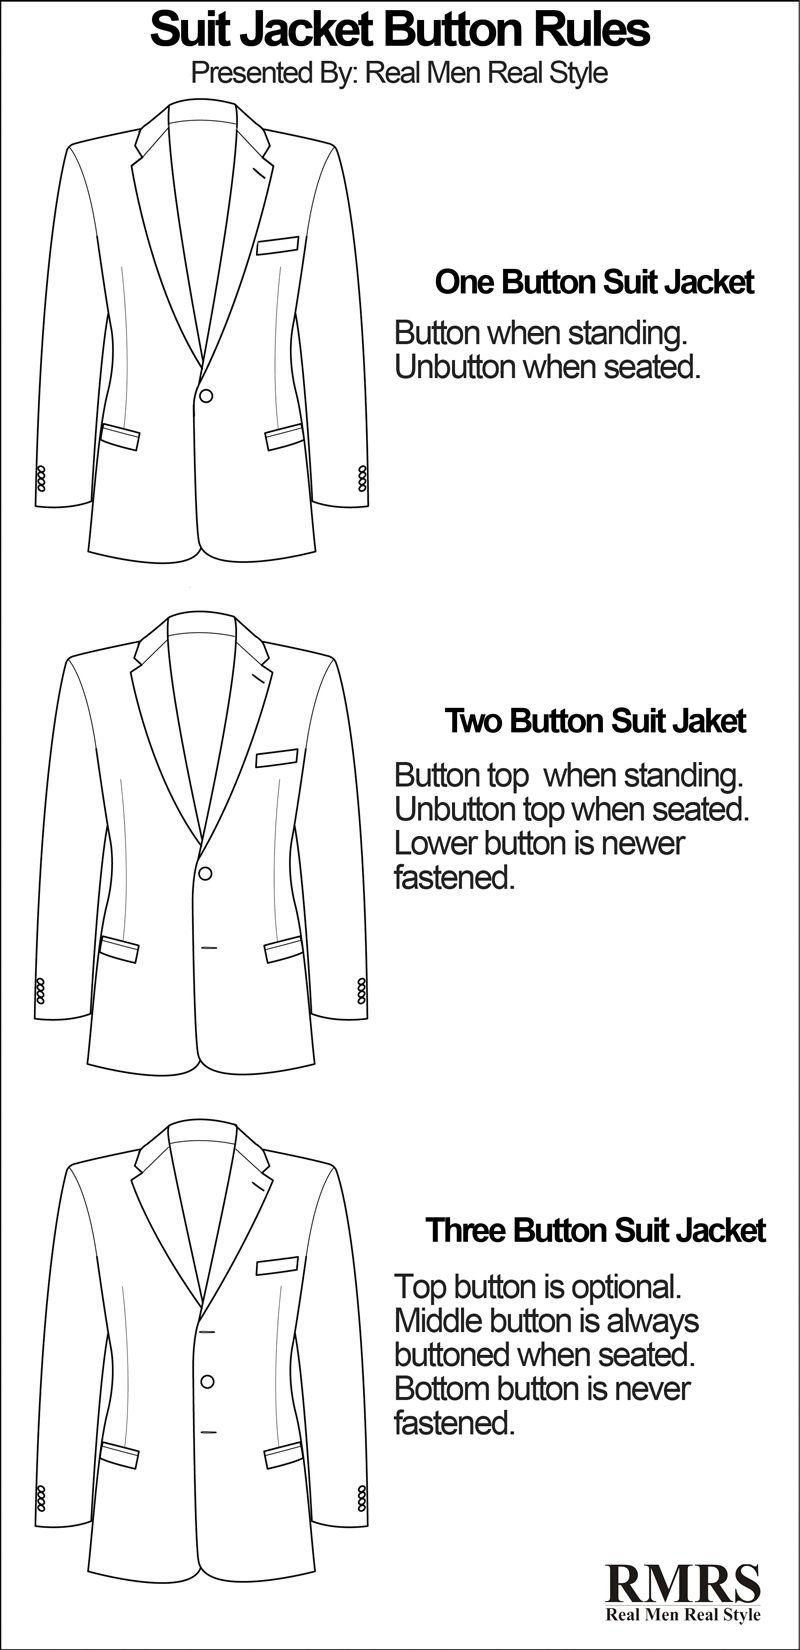 best loved f2165 cb721 10 Suit Jacket Style Details Men Should Know   Suit Jackets Silhouettes  Buttons Single Vs Double